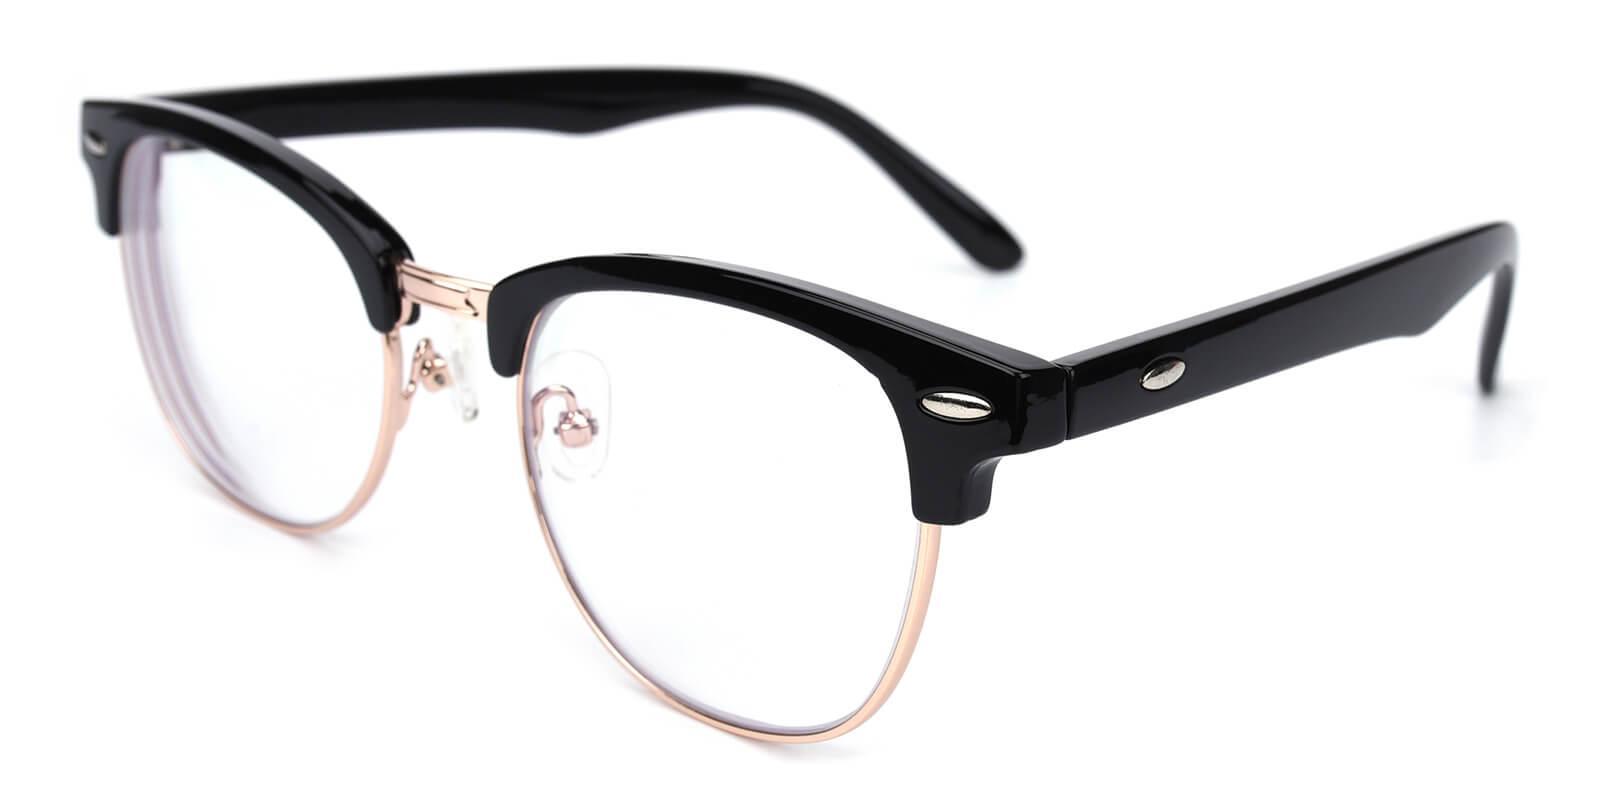 Ancient-Black-Browline-Metal-Eyeglasses-additional1